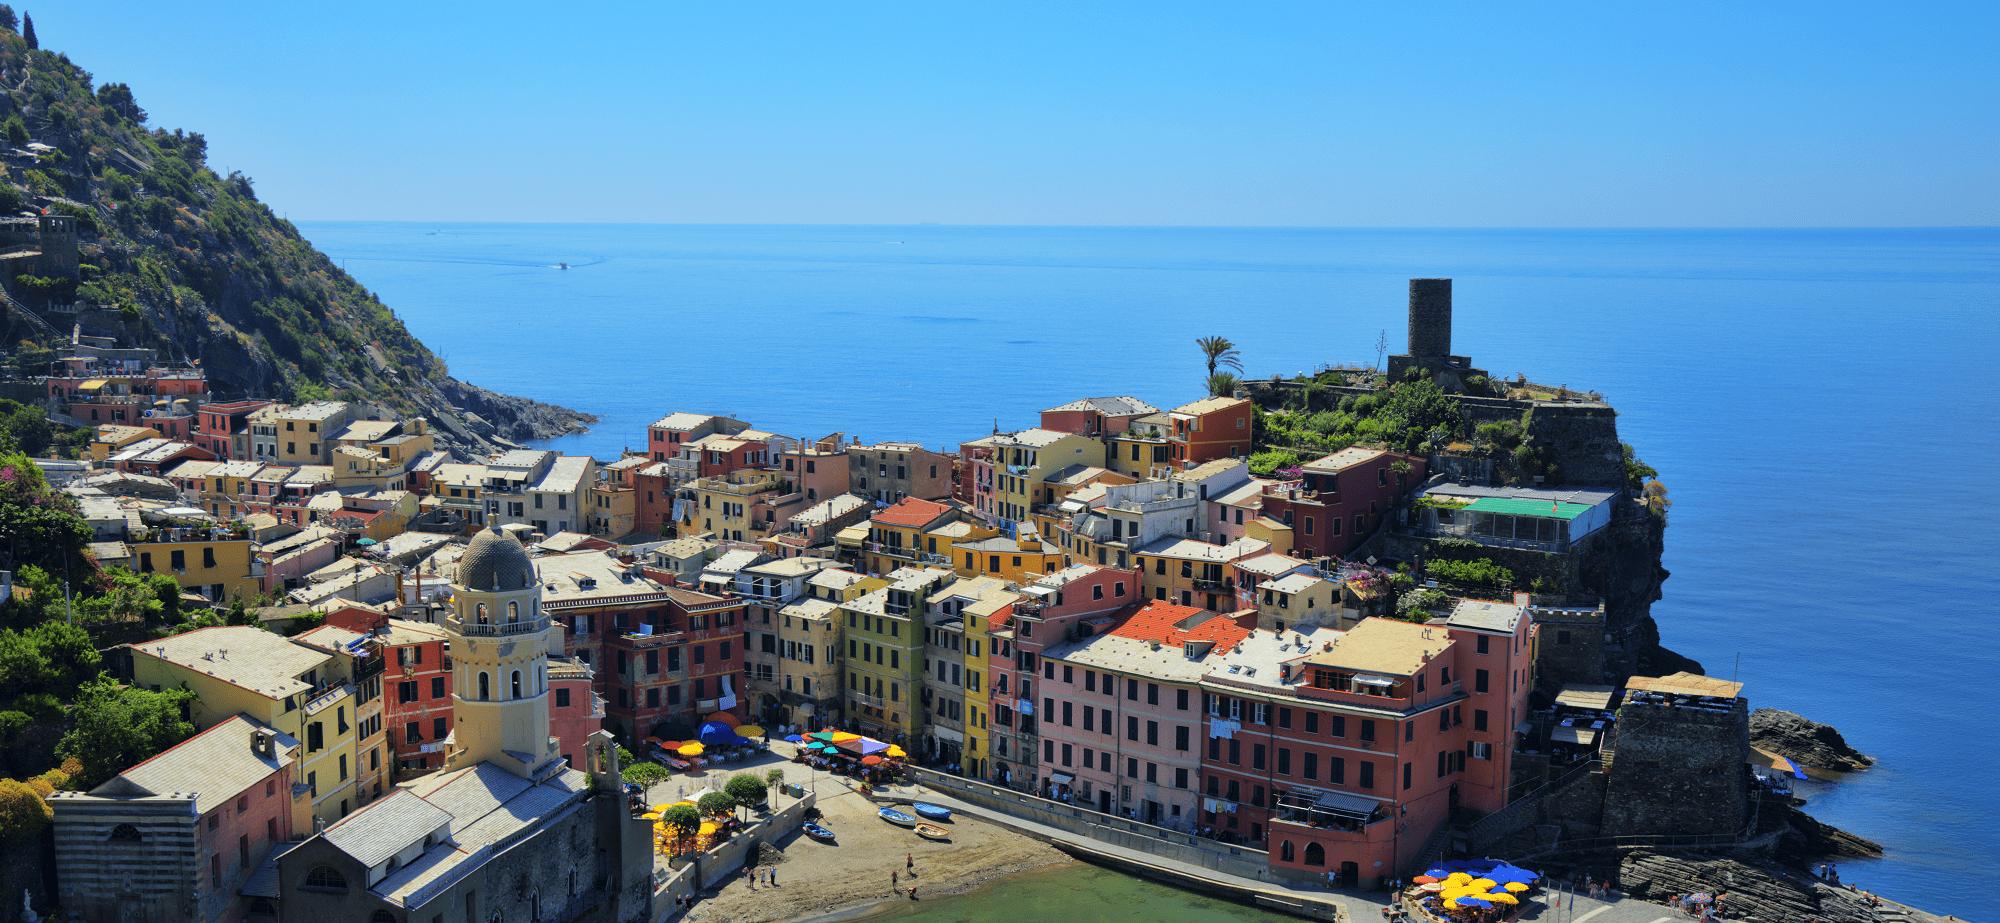 Cinque Terre town of Vernazza